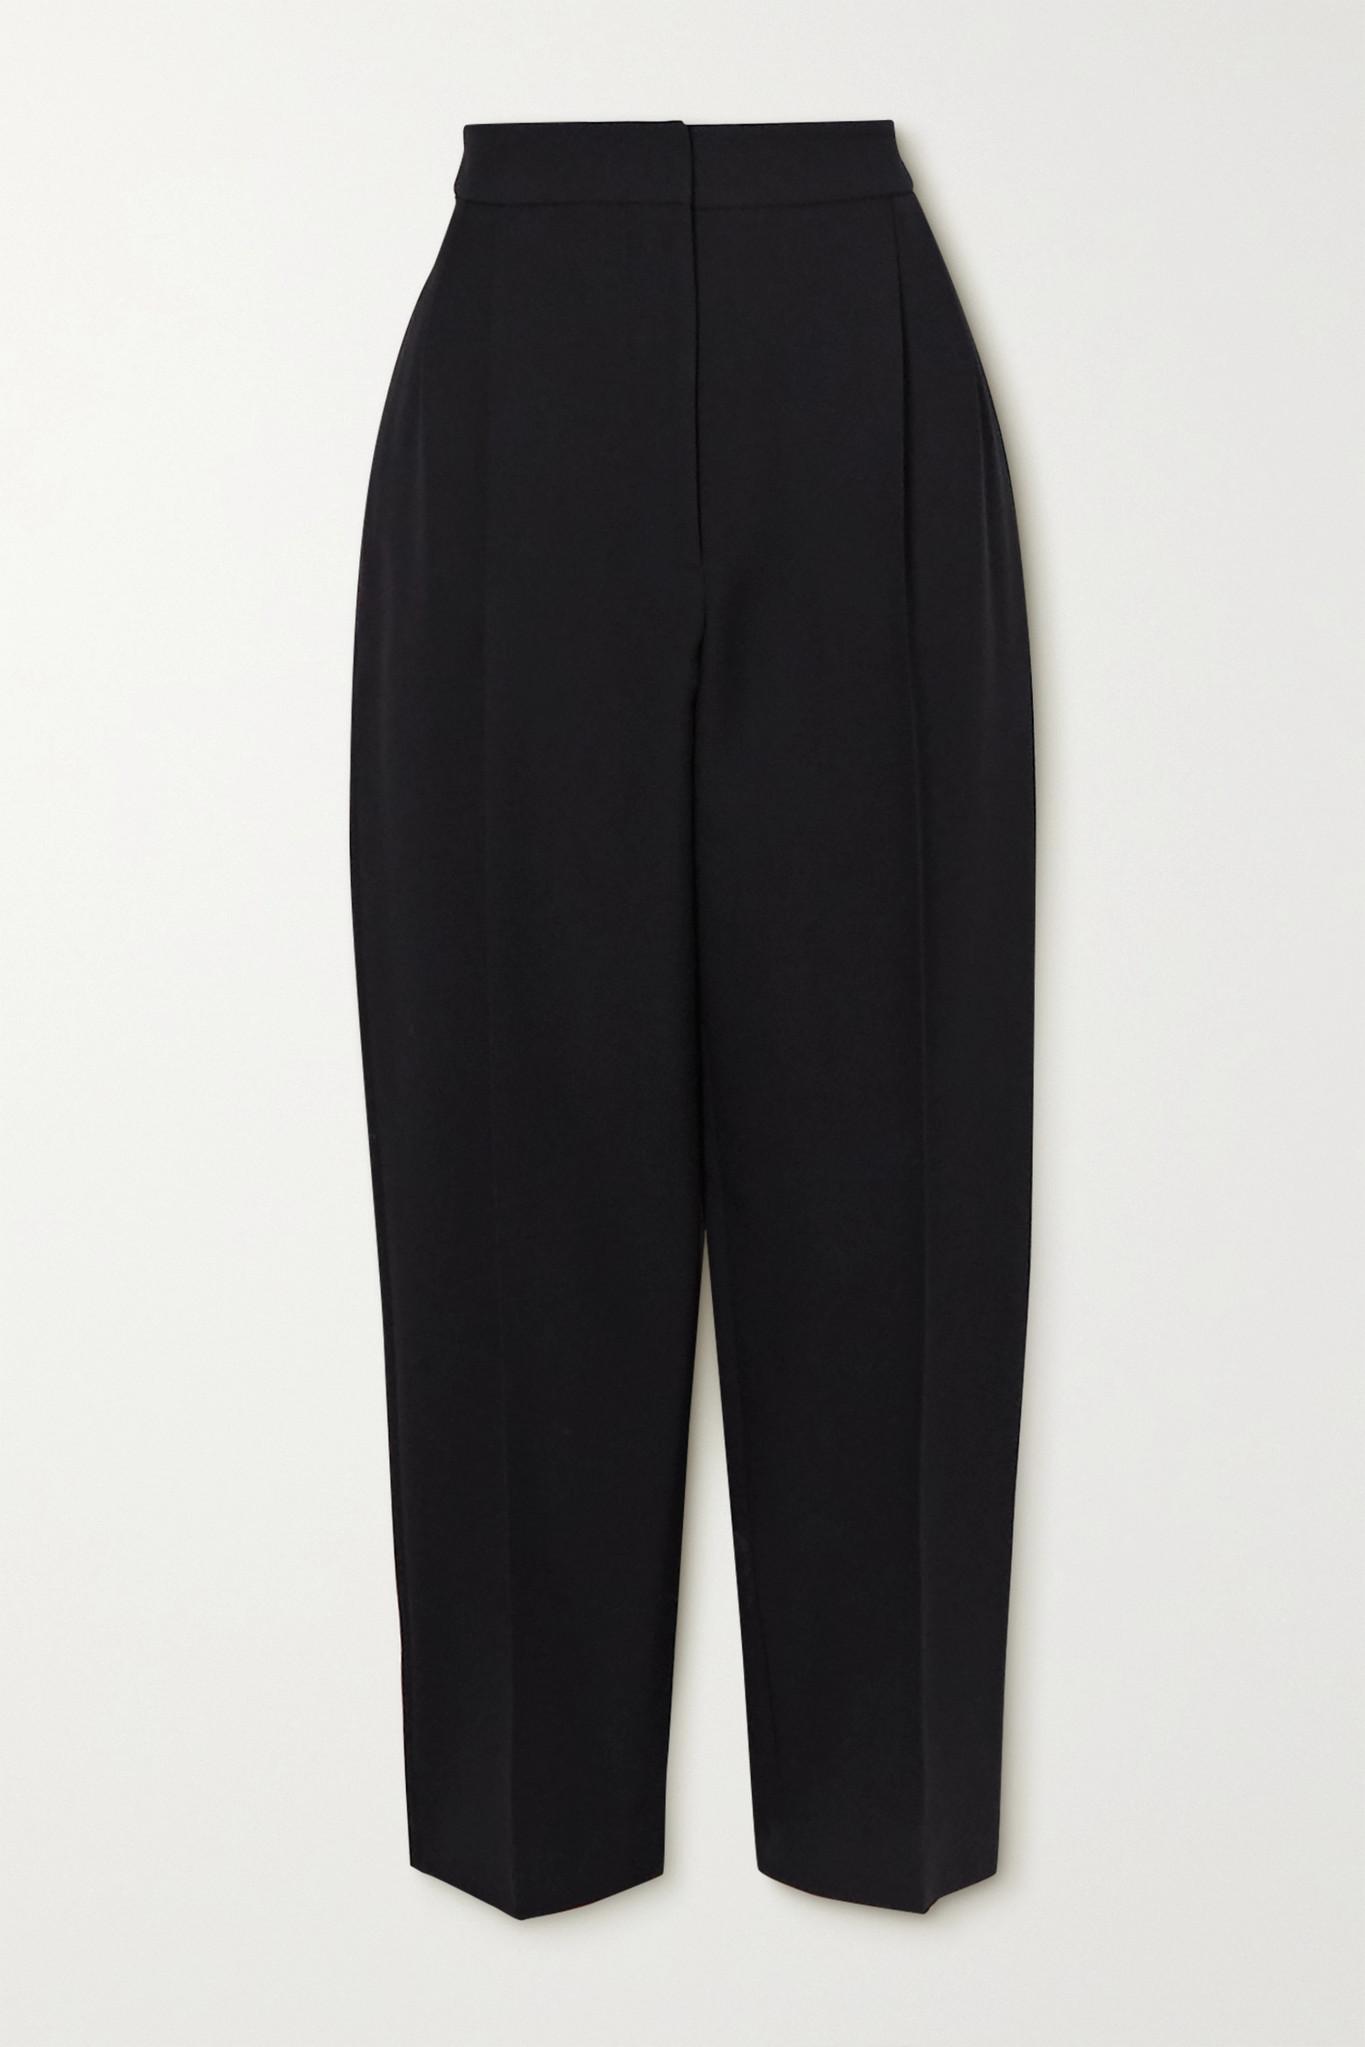 ALEXANDER MCQUEEN - Cropped Wool-blend Tapered Pants - Black - IT42